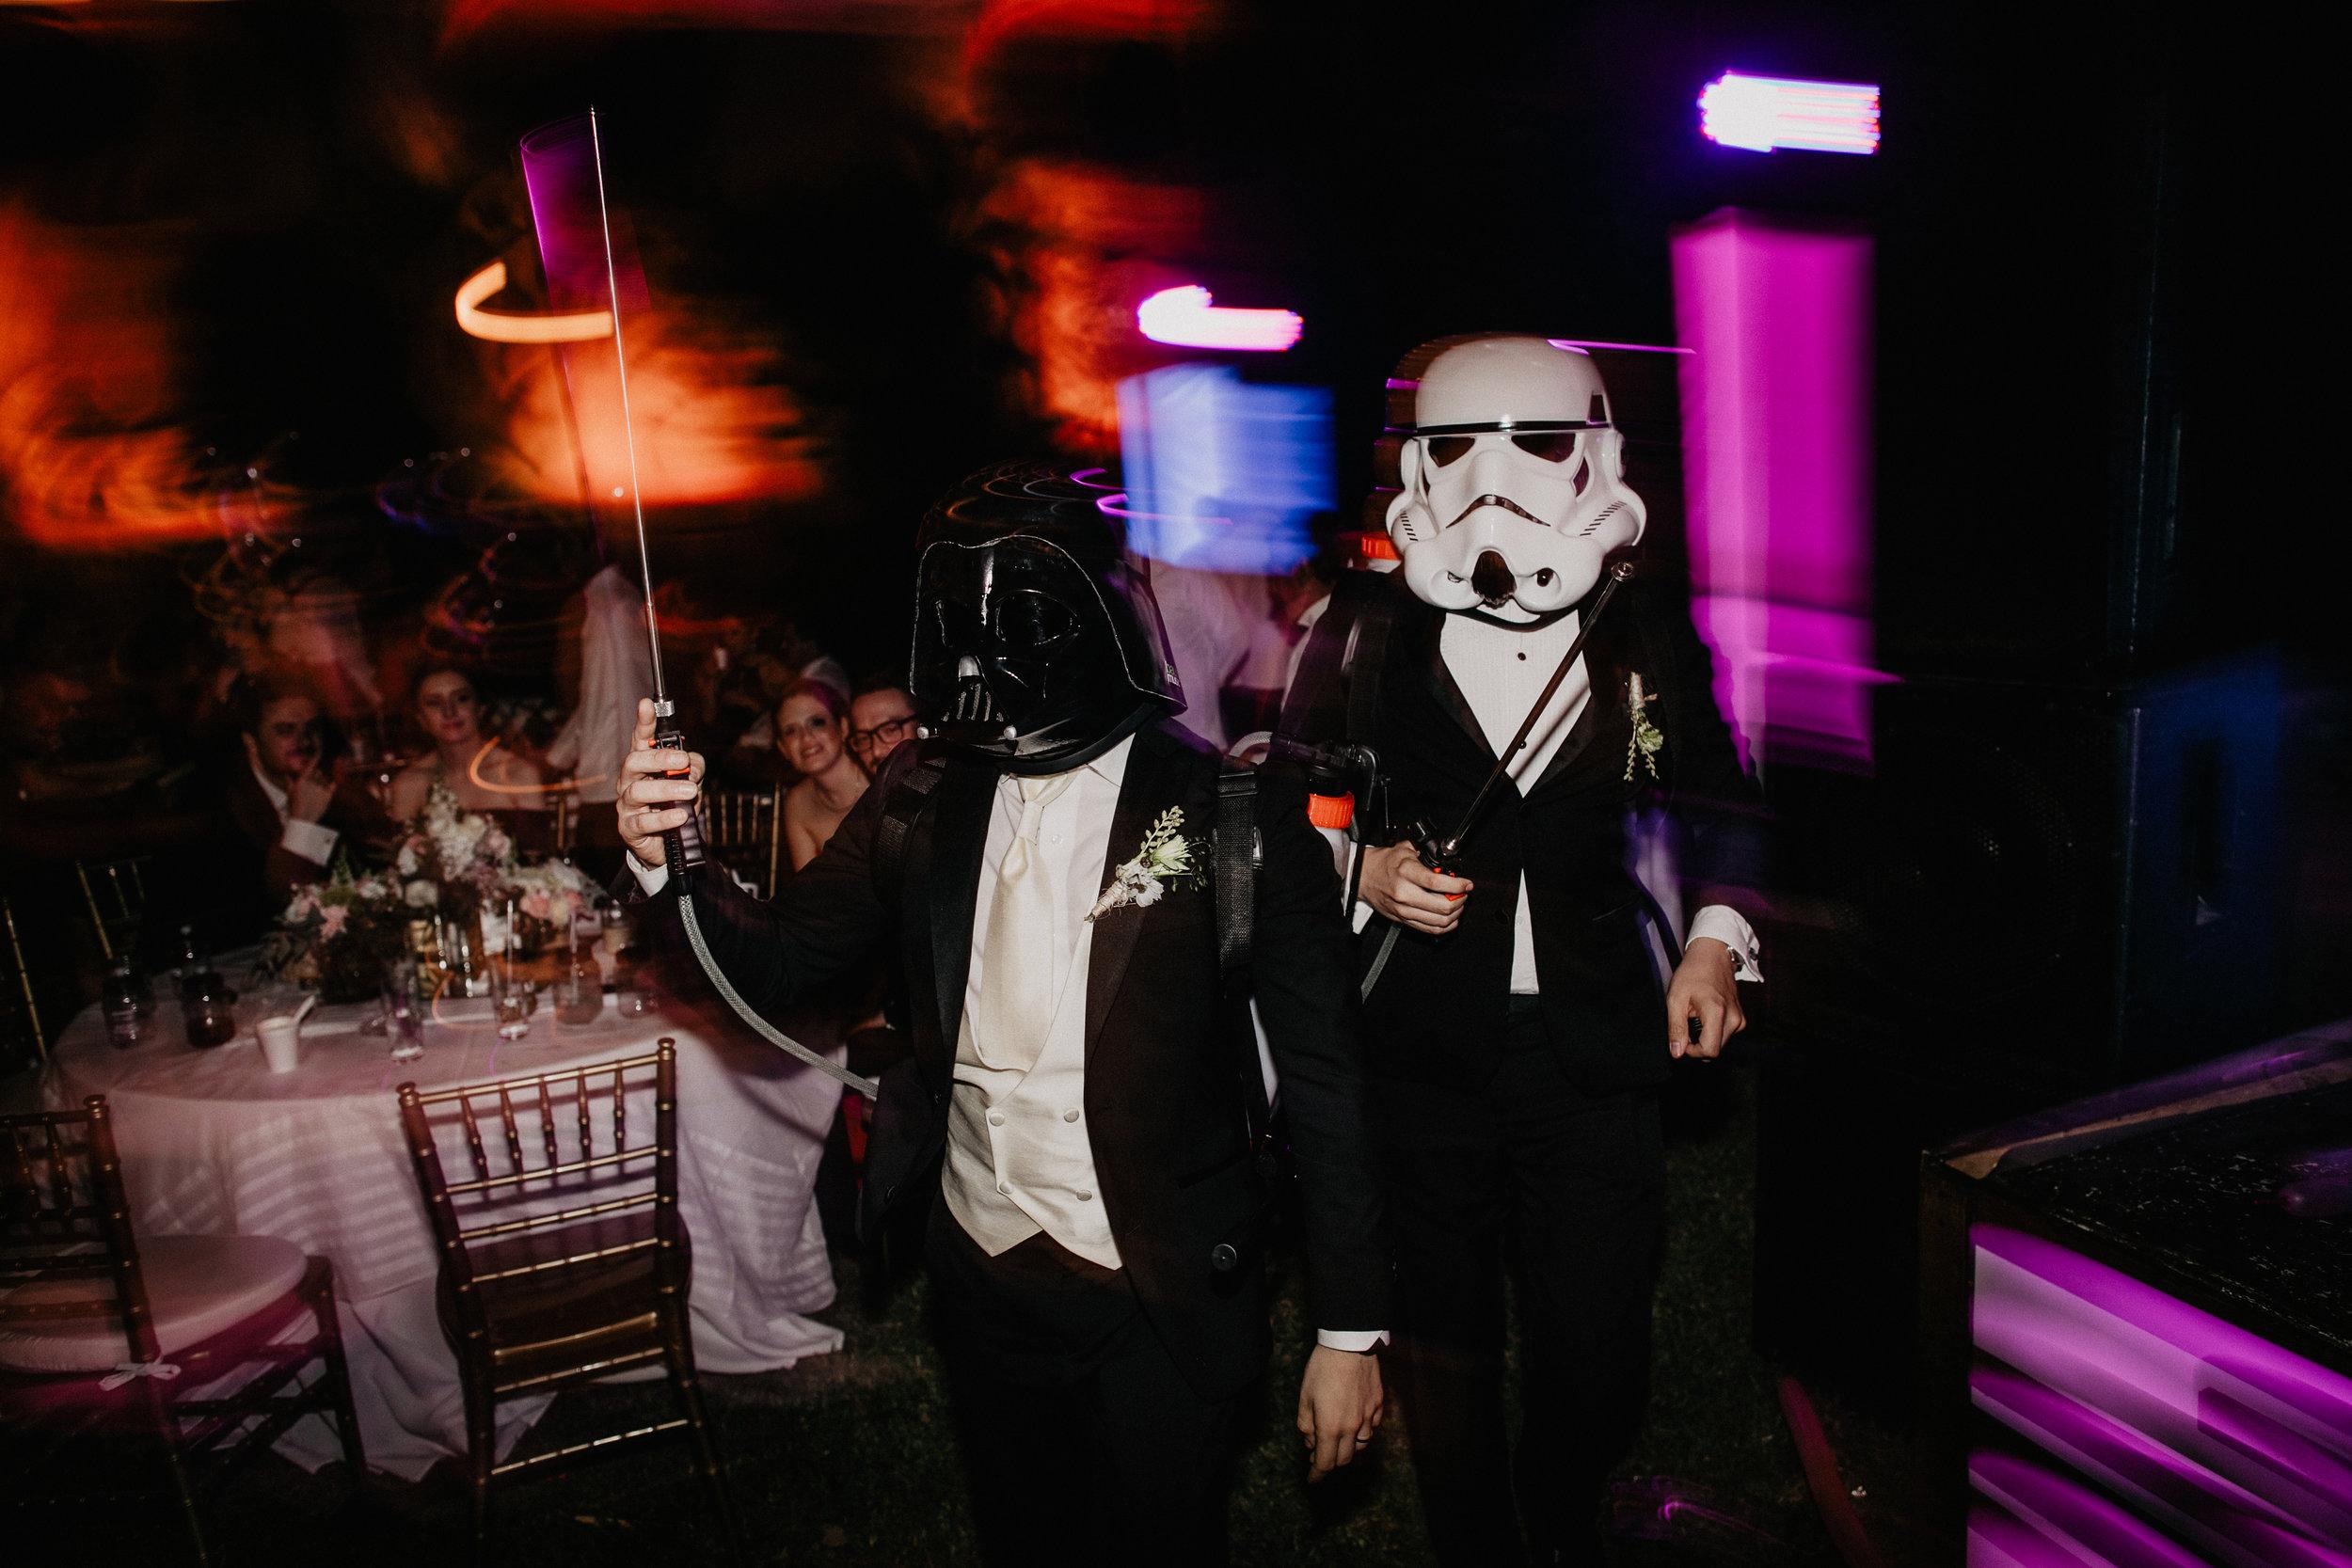 Alfonso_flores_destination_wedding_photography_vanesa_carlos-1267.JPG